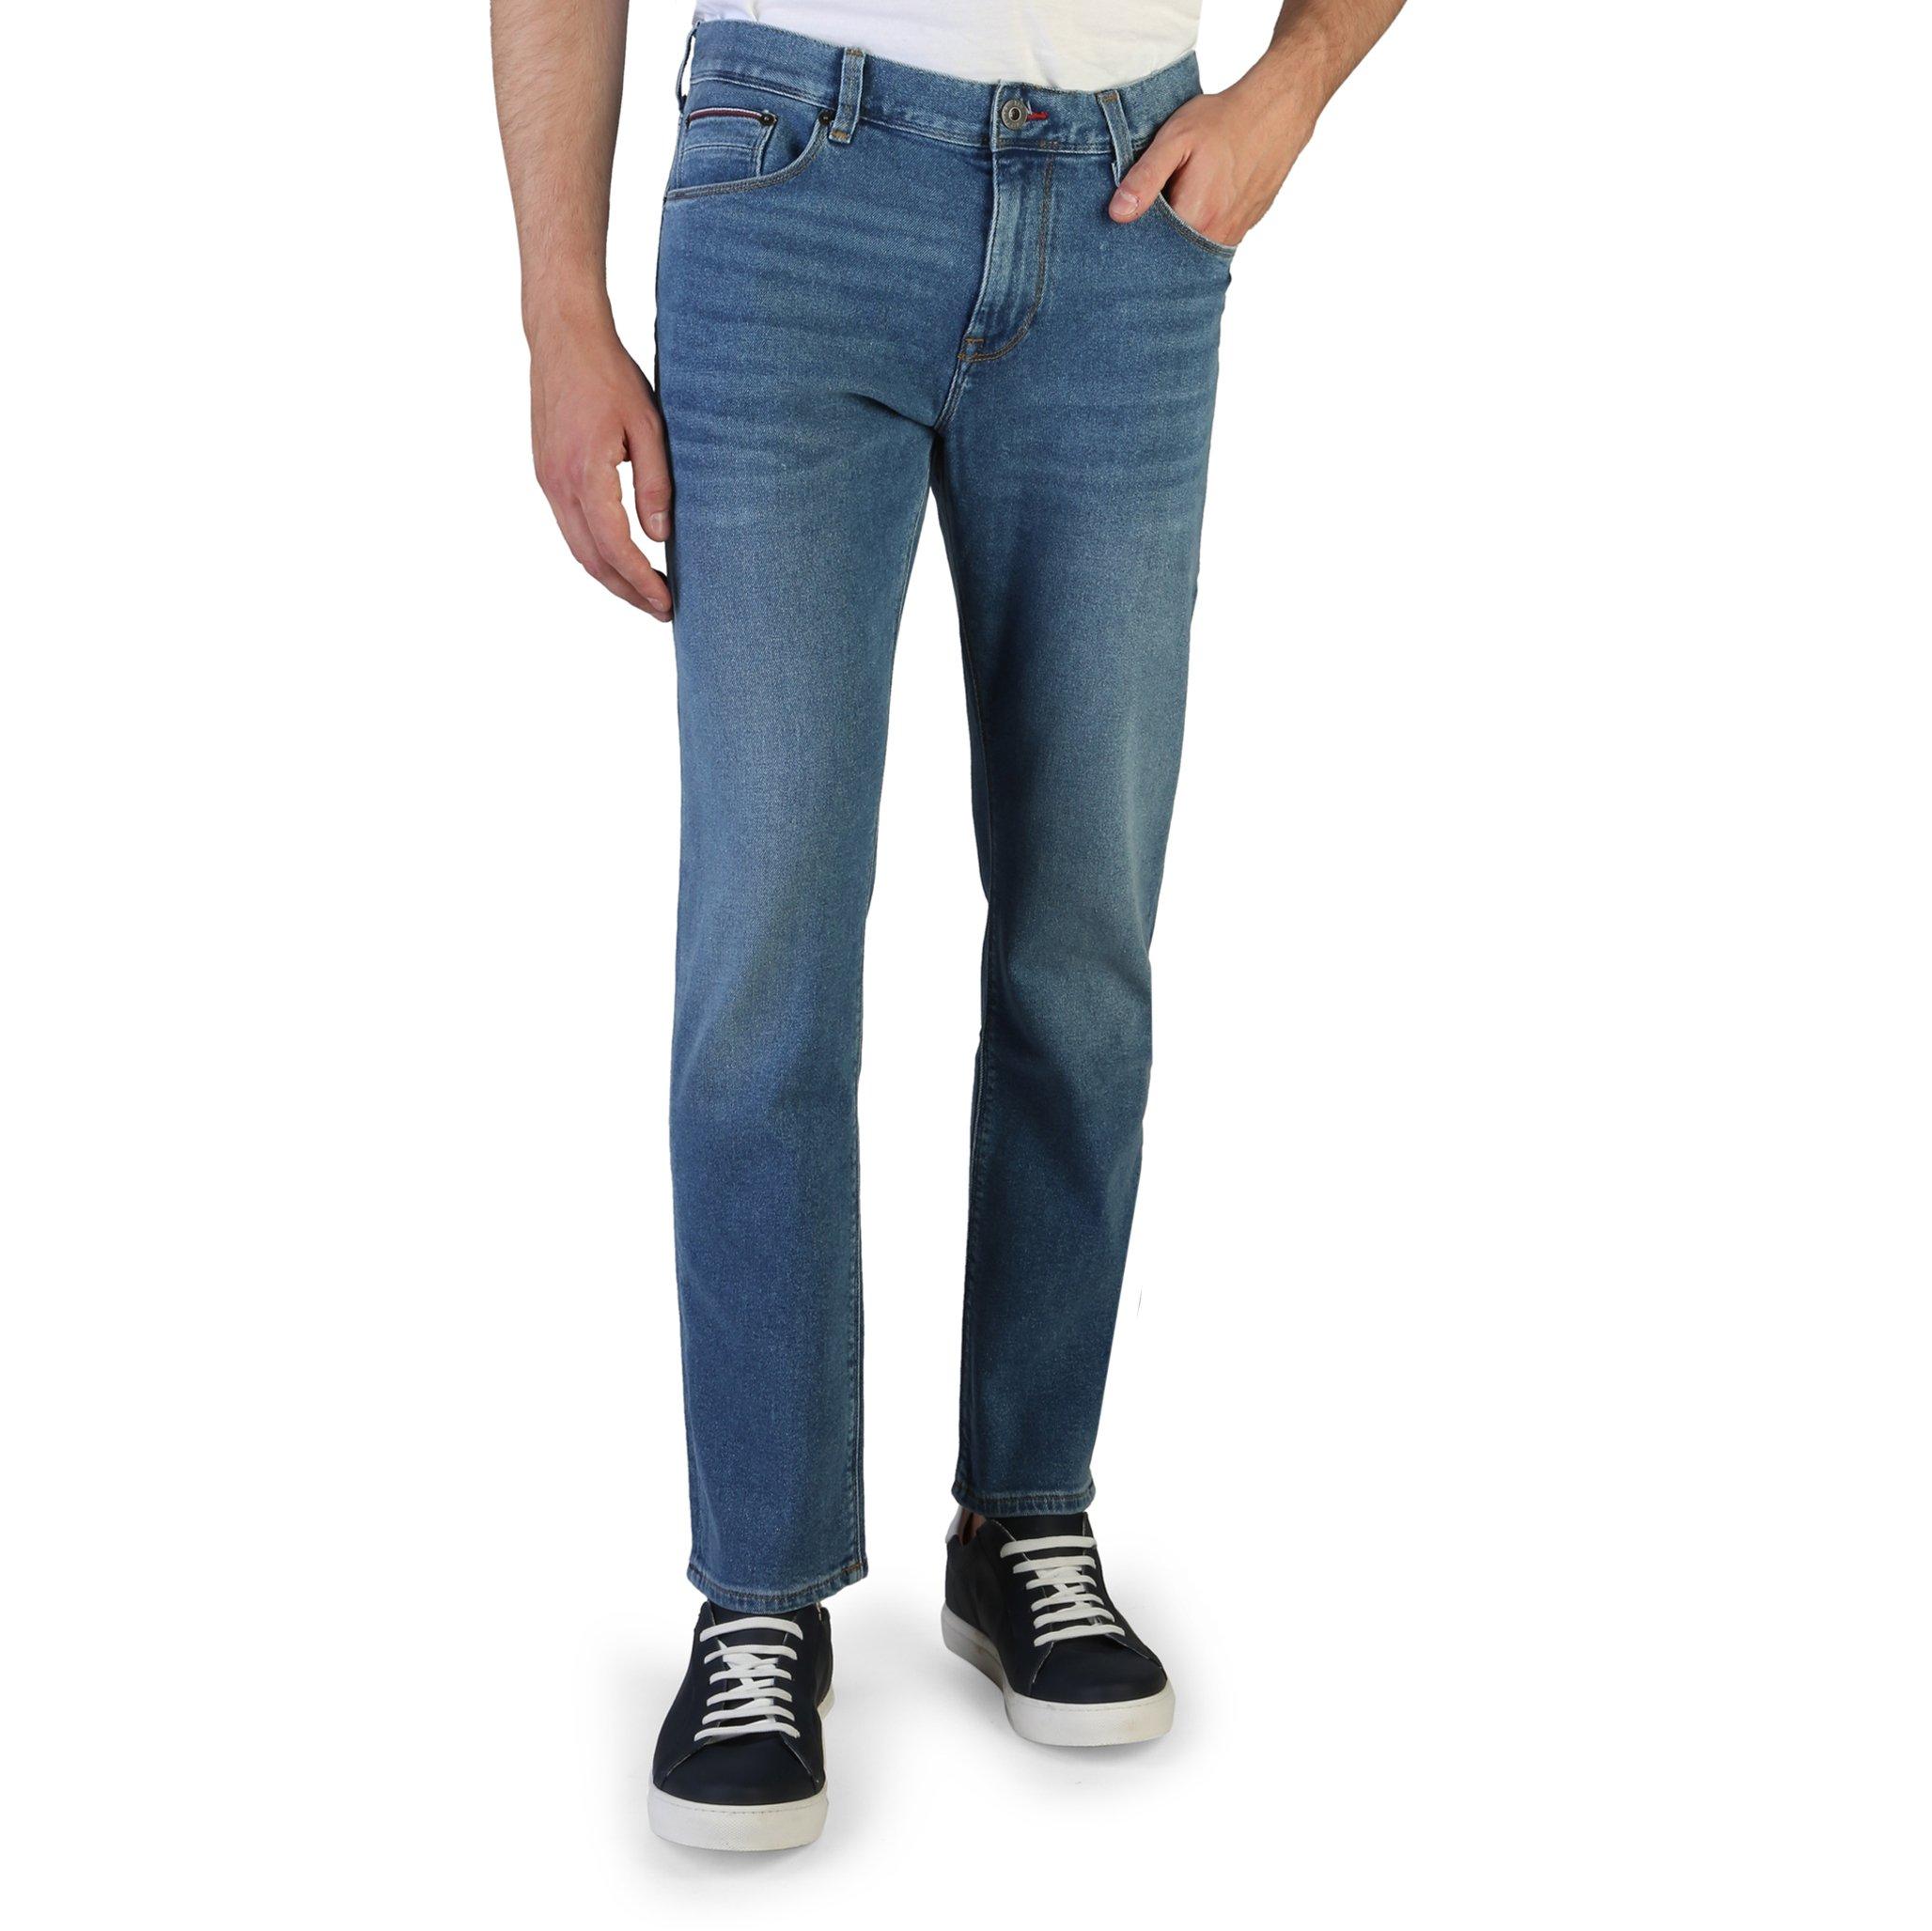 Tommy Hilfiger Men's Jeans Blue MW0MW07082 - blue-1 36